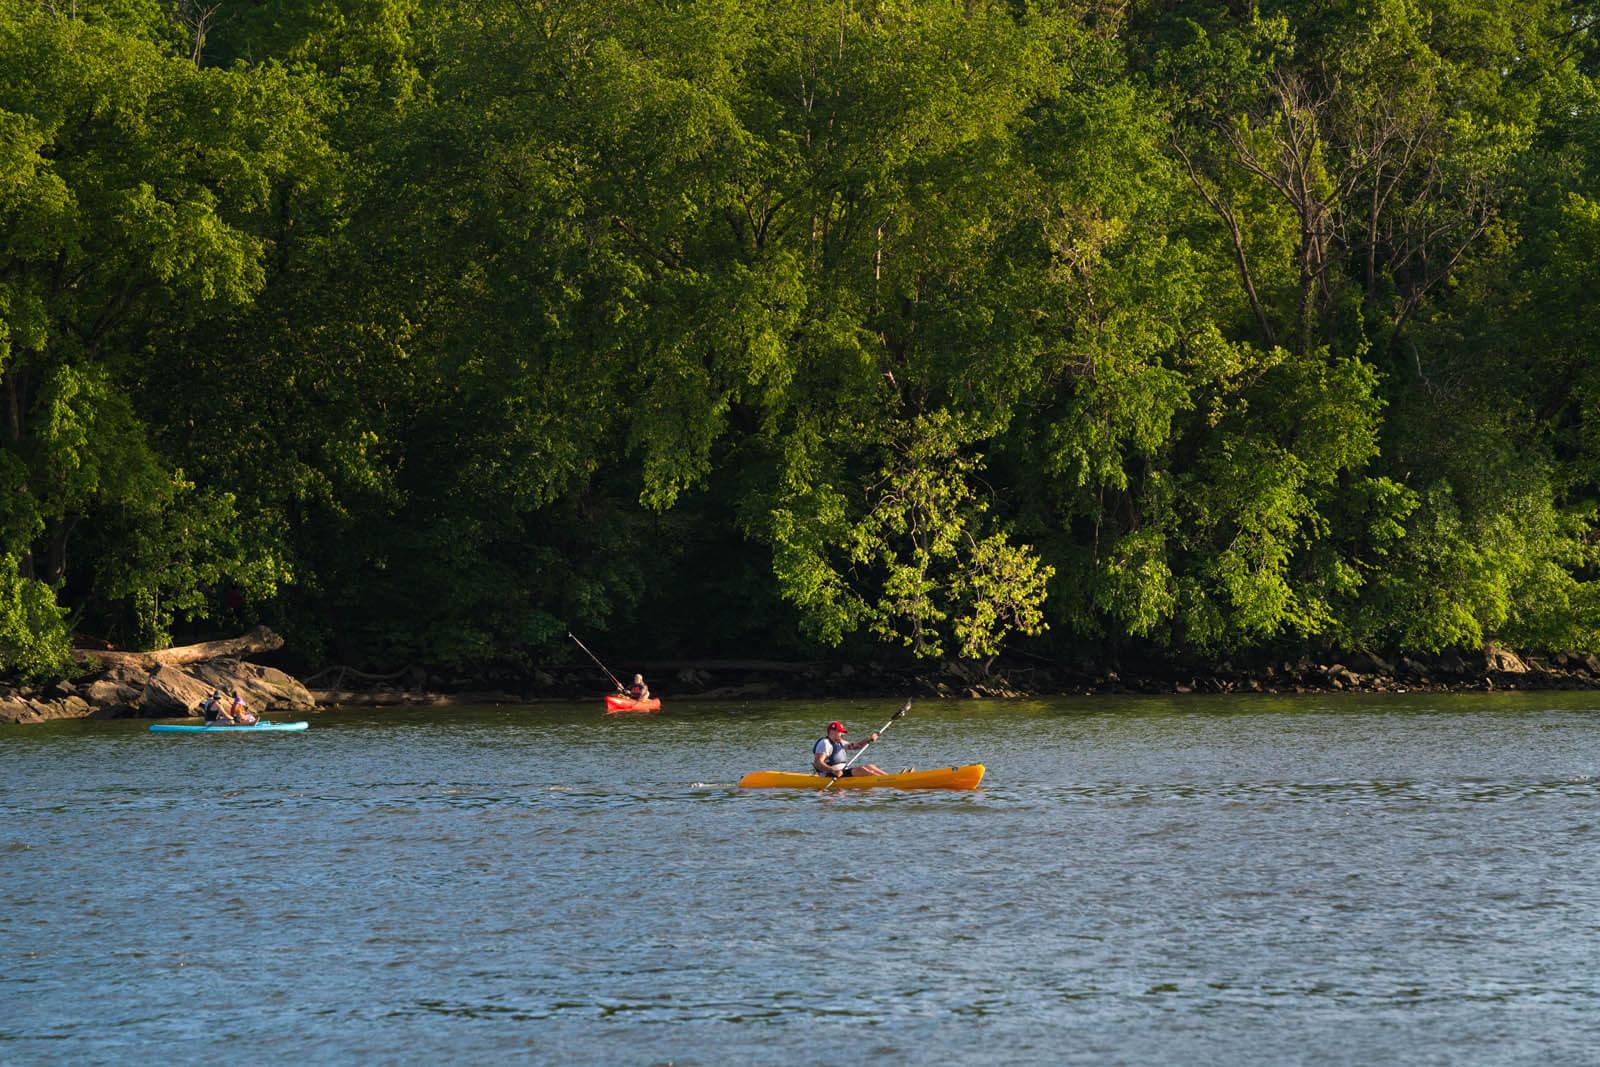 Kayaks on the Potomac River in Georgetown Washington DC